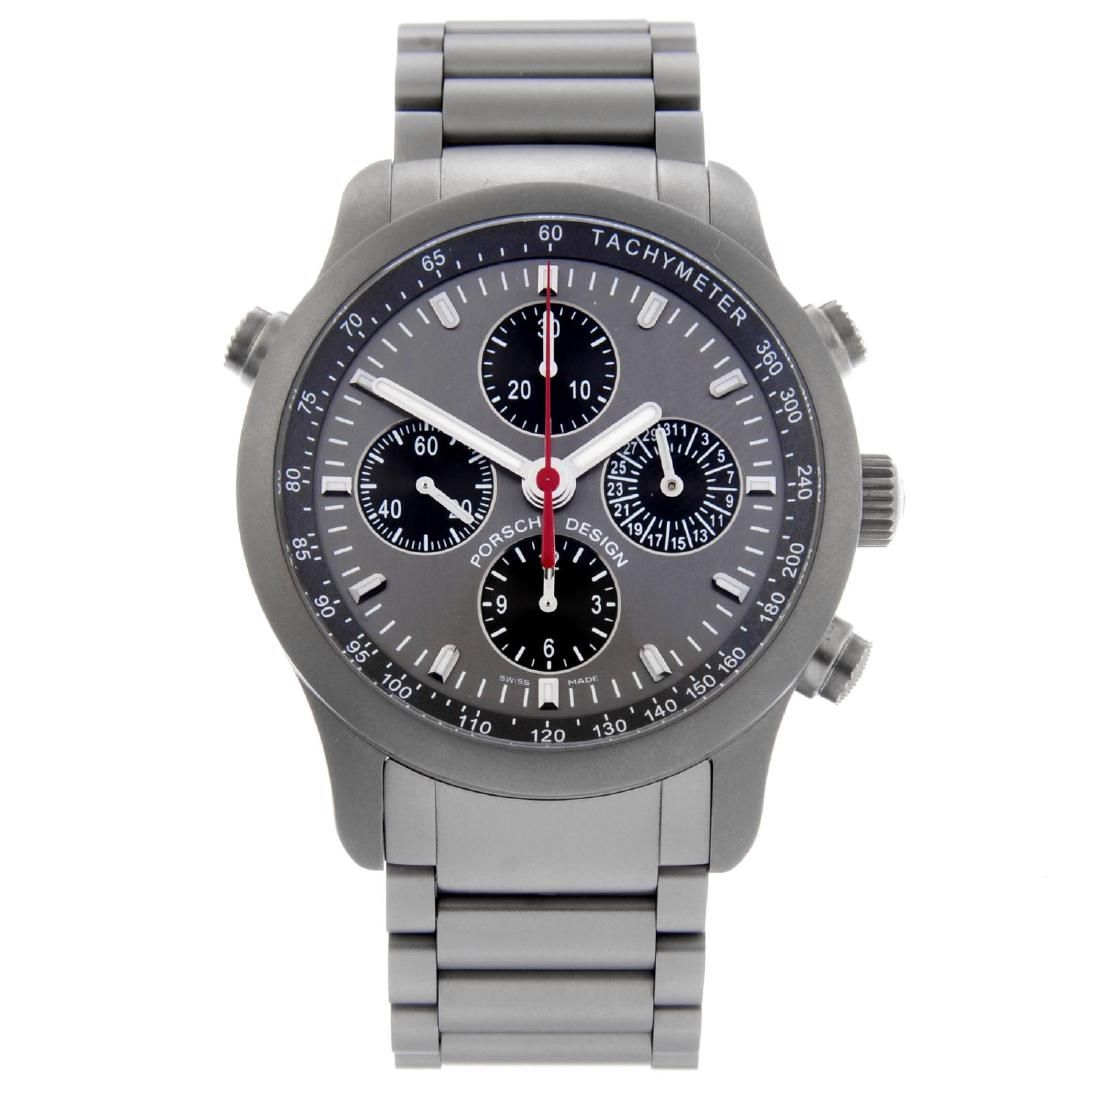 PORSCHE DESIGN - a gentleman's PTR chronograph bracelet